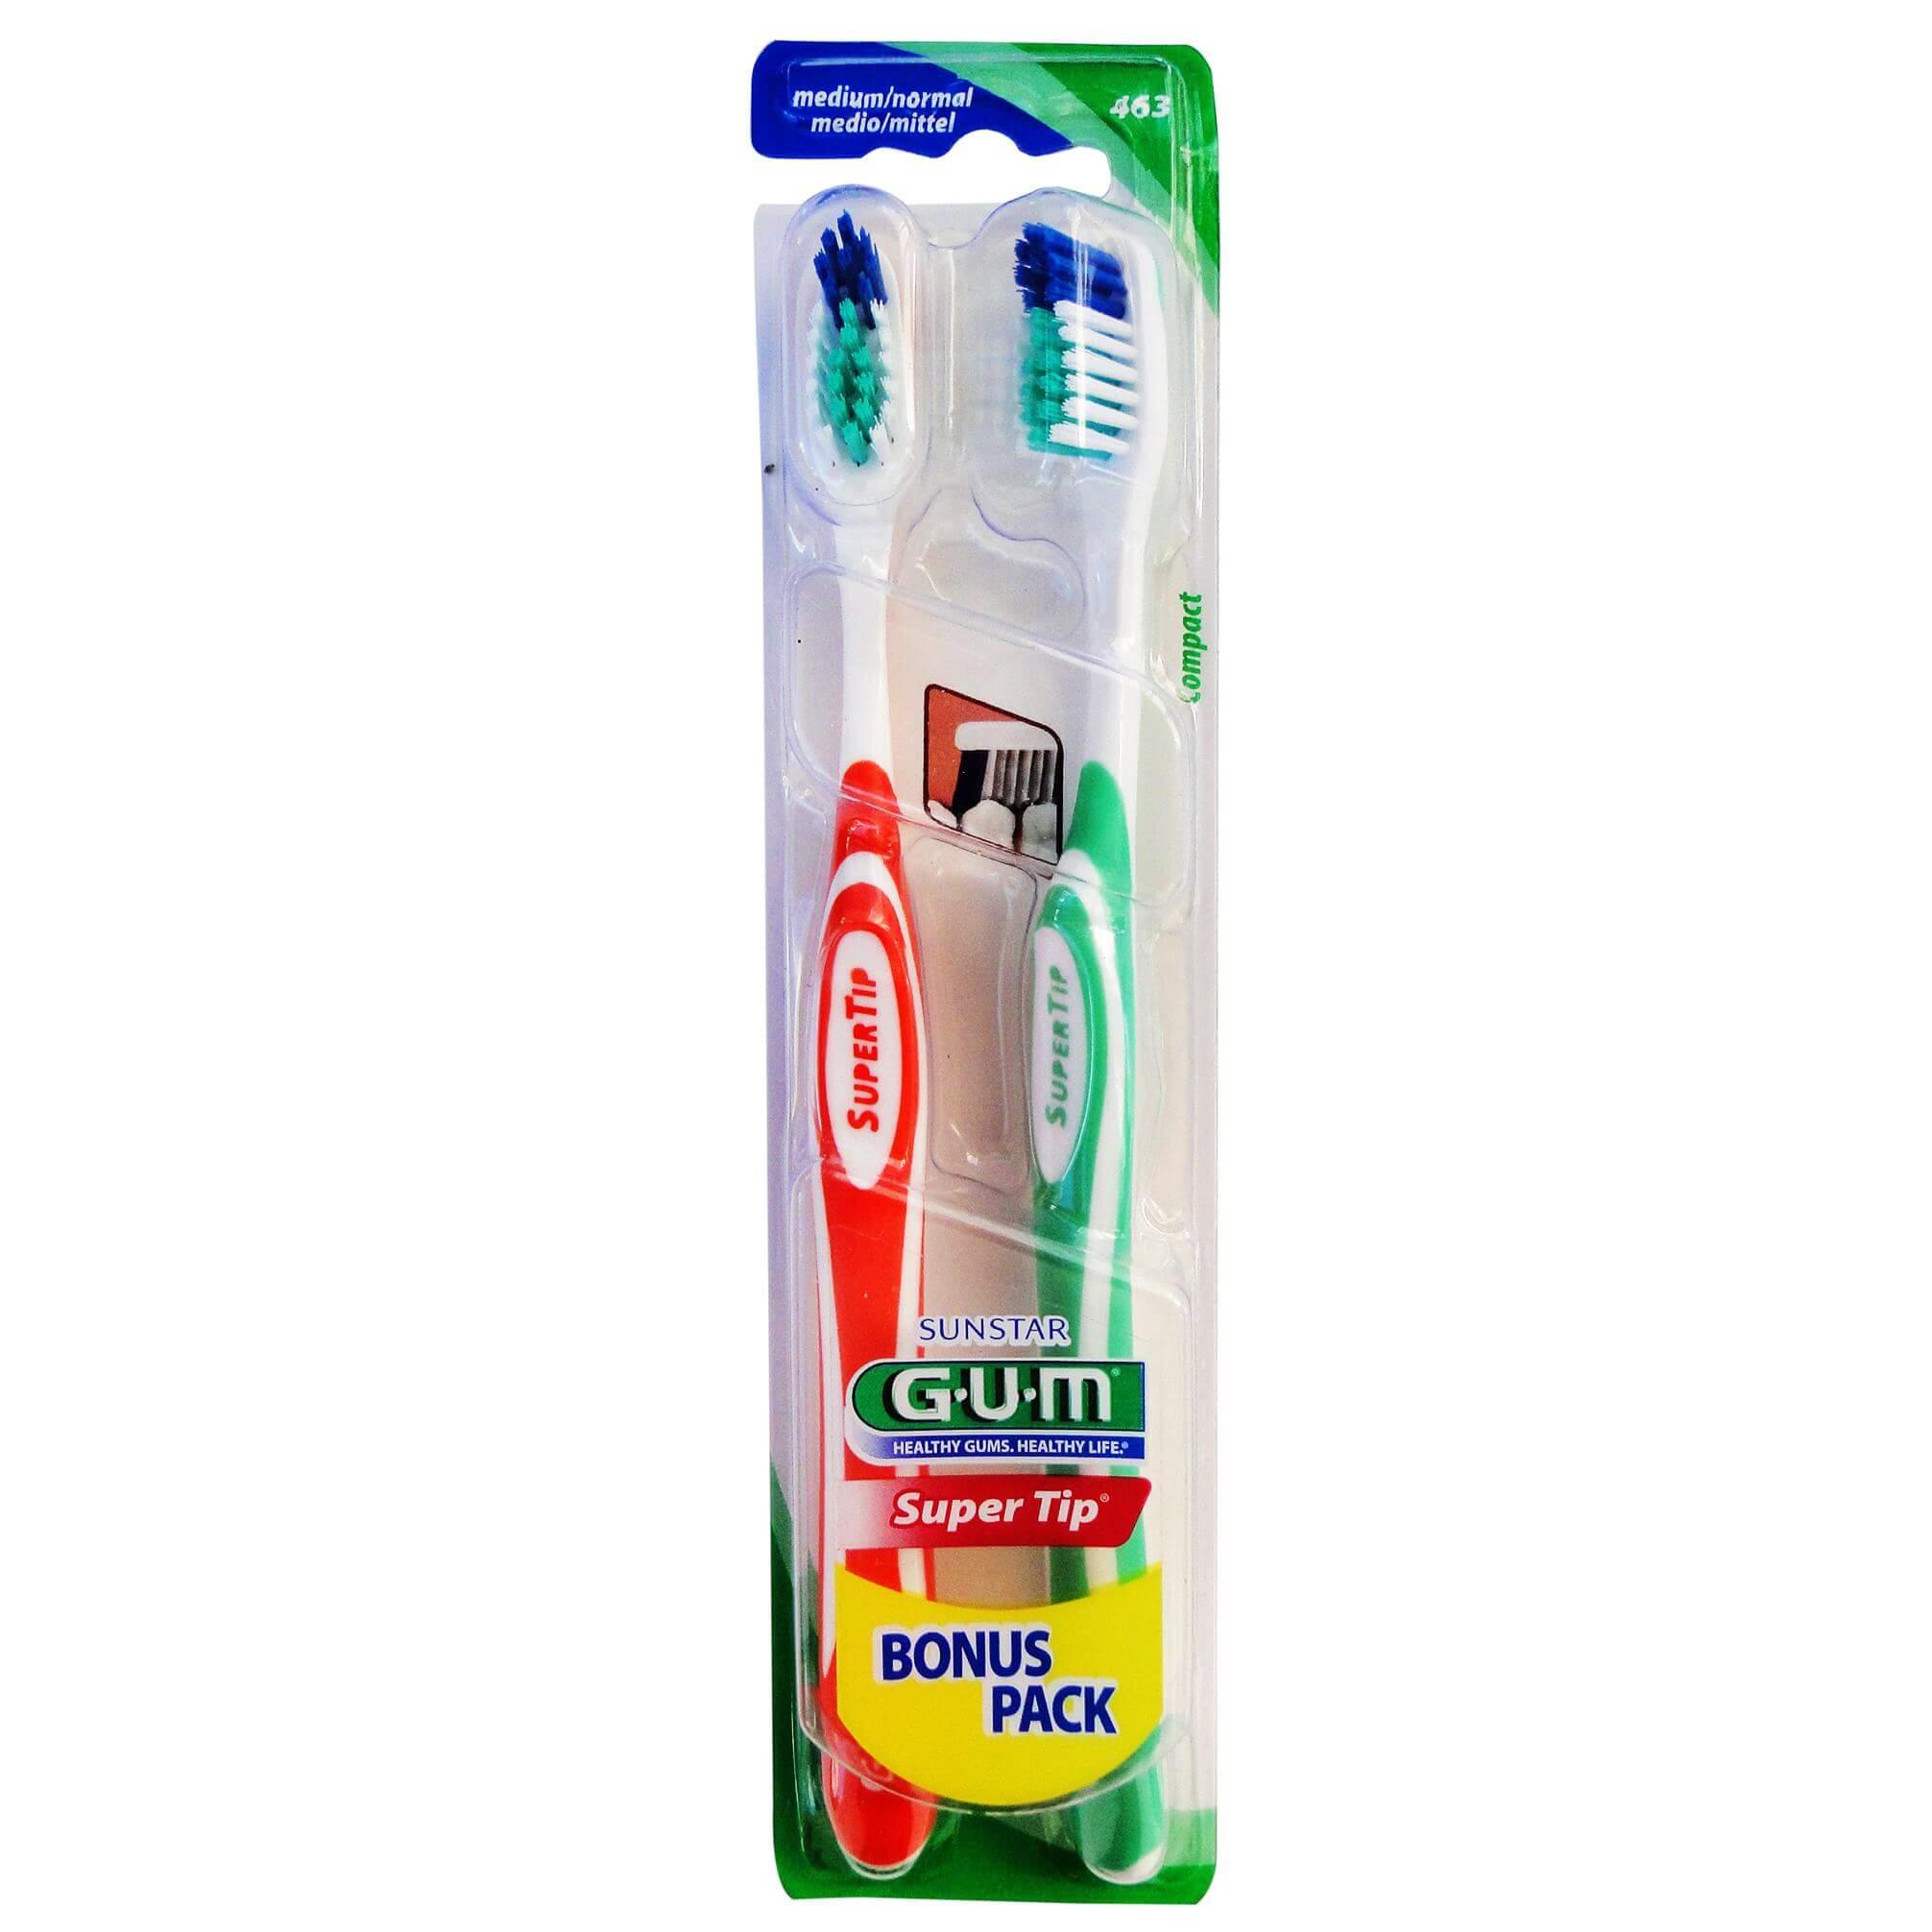 Gum Super Tip Compact Medium/Normal Οδοντόβουρτσα σε Διάφορα Χρώματα 2τμχ (463)